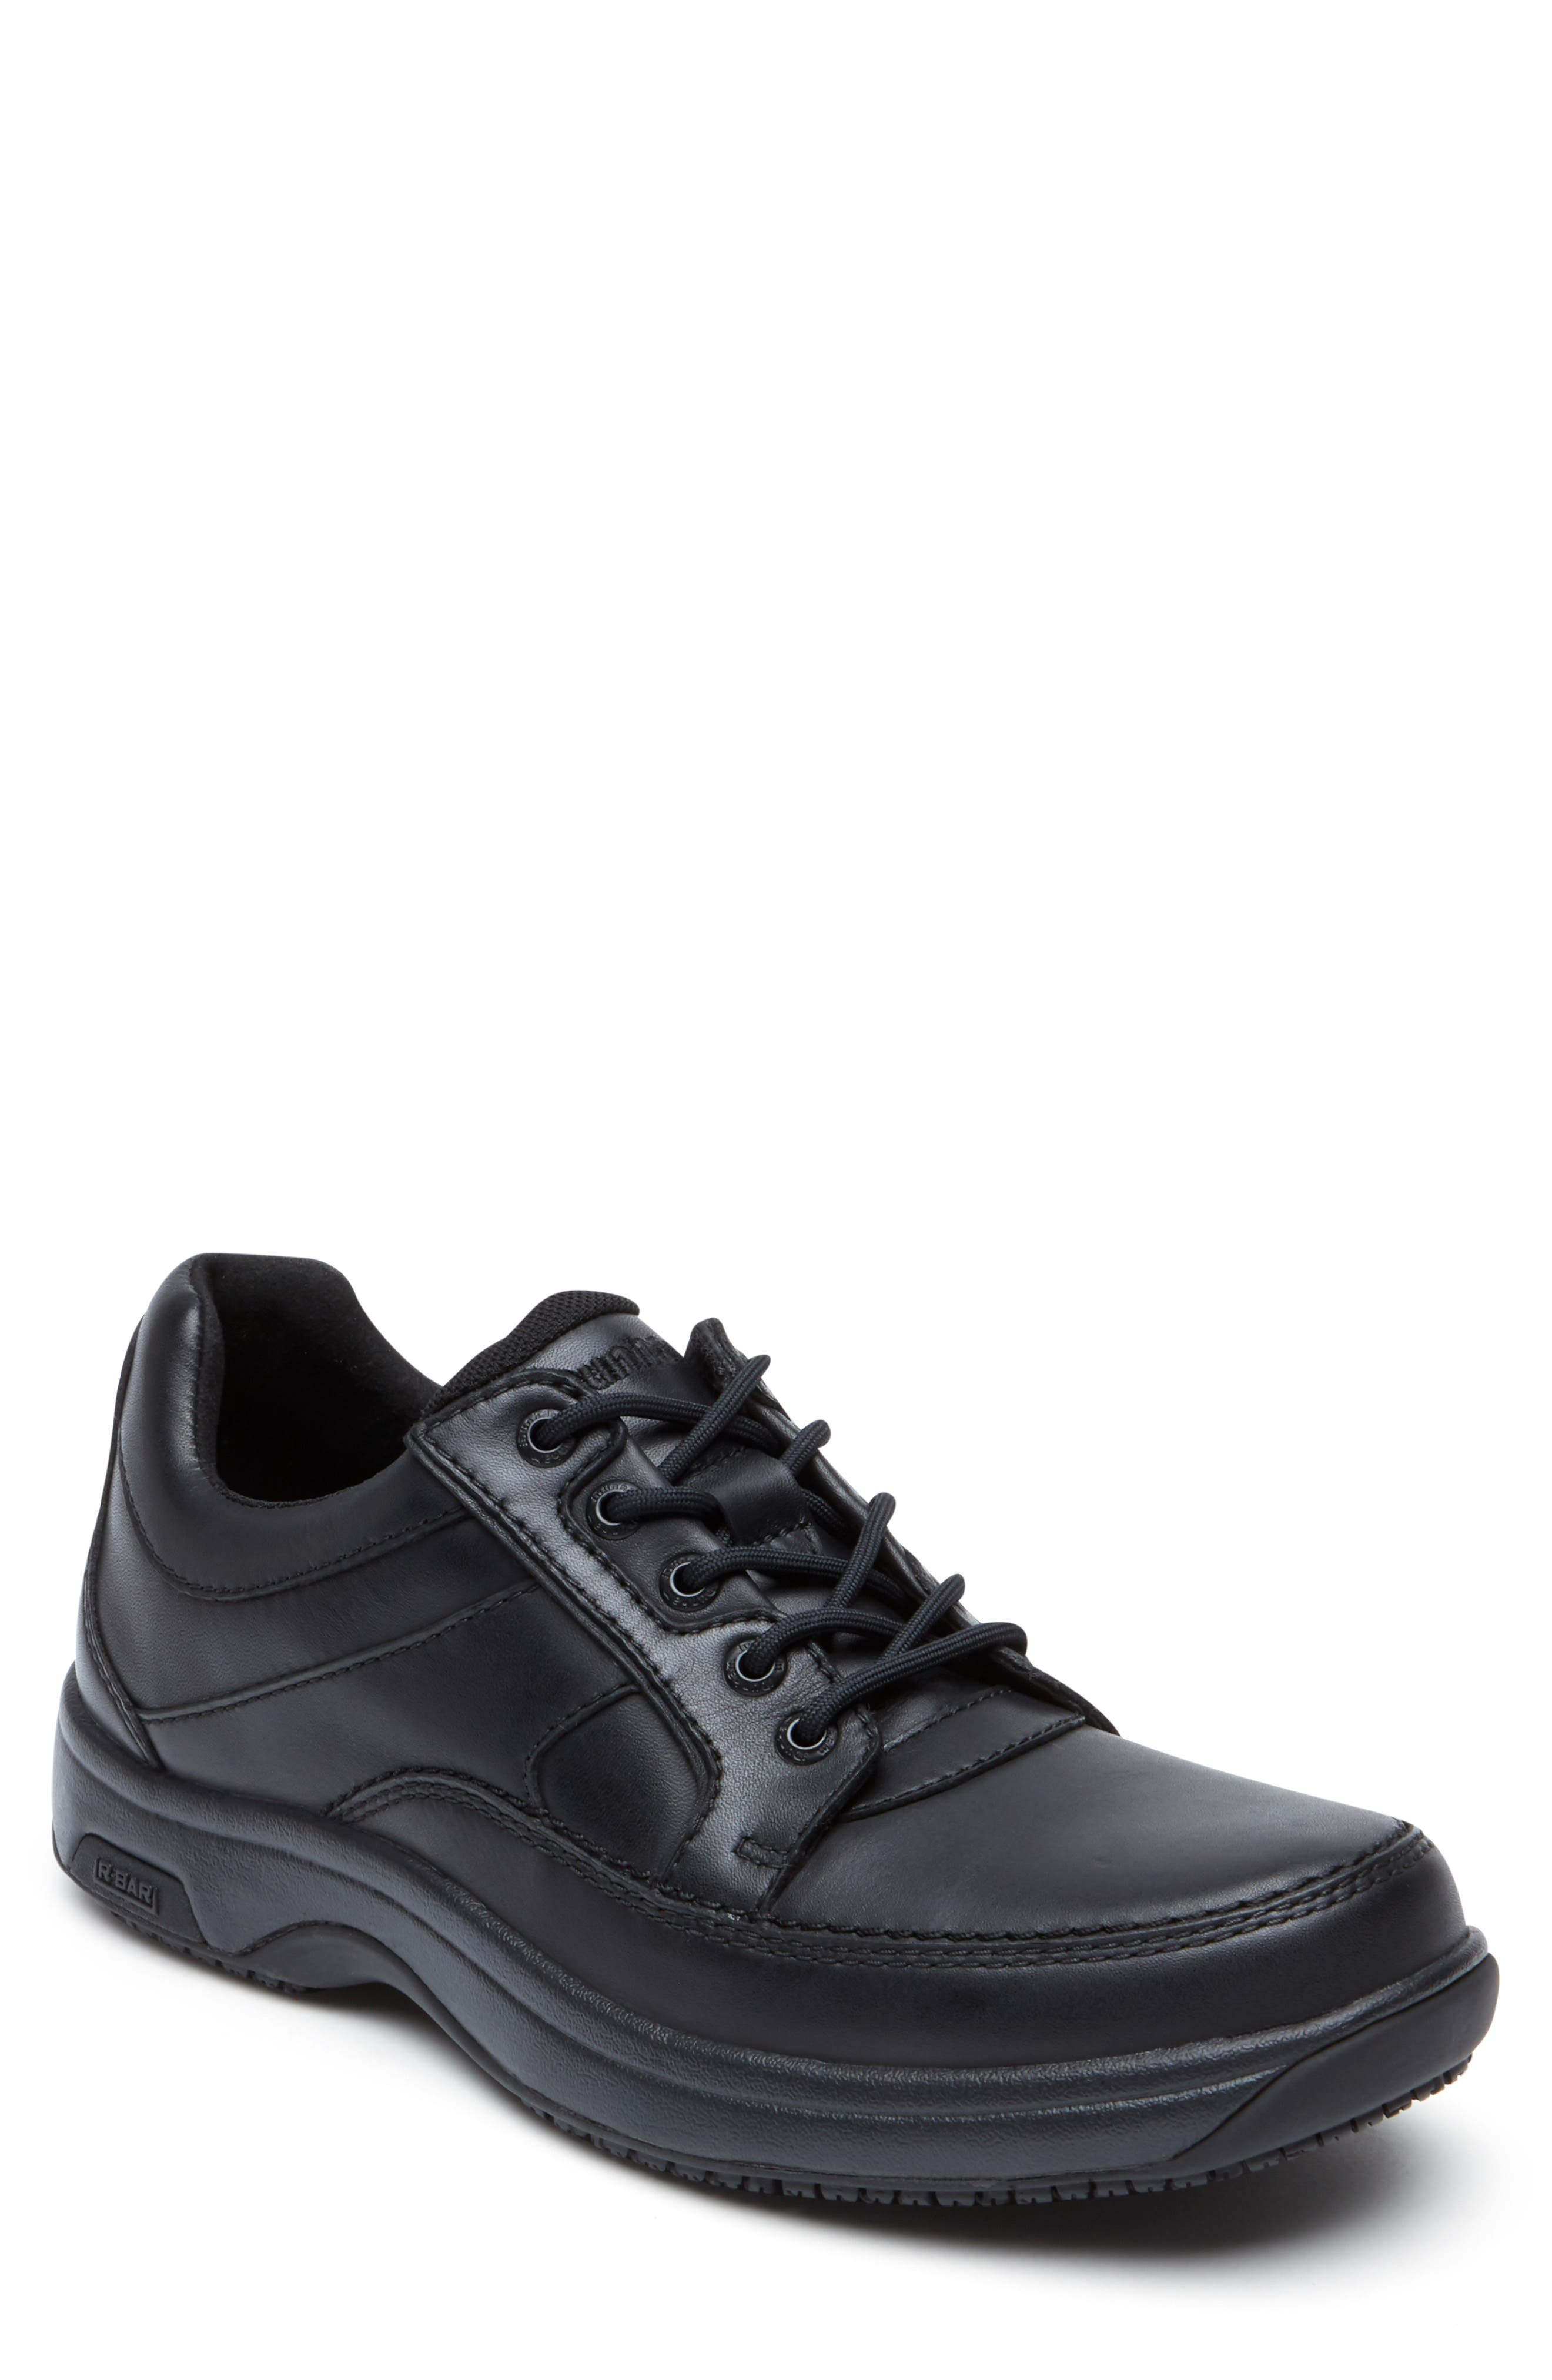 DUNHAM, 'Midland' Sneaker, Main thumbnail 1, color, BLACK LEATHER